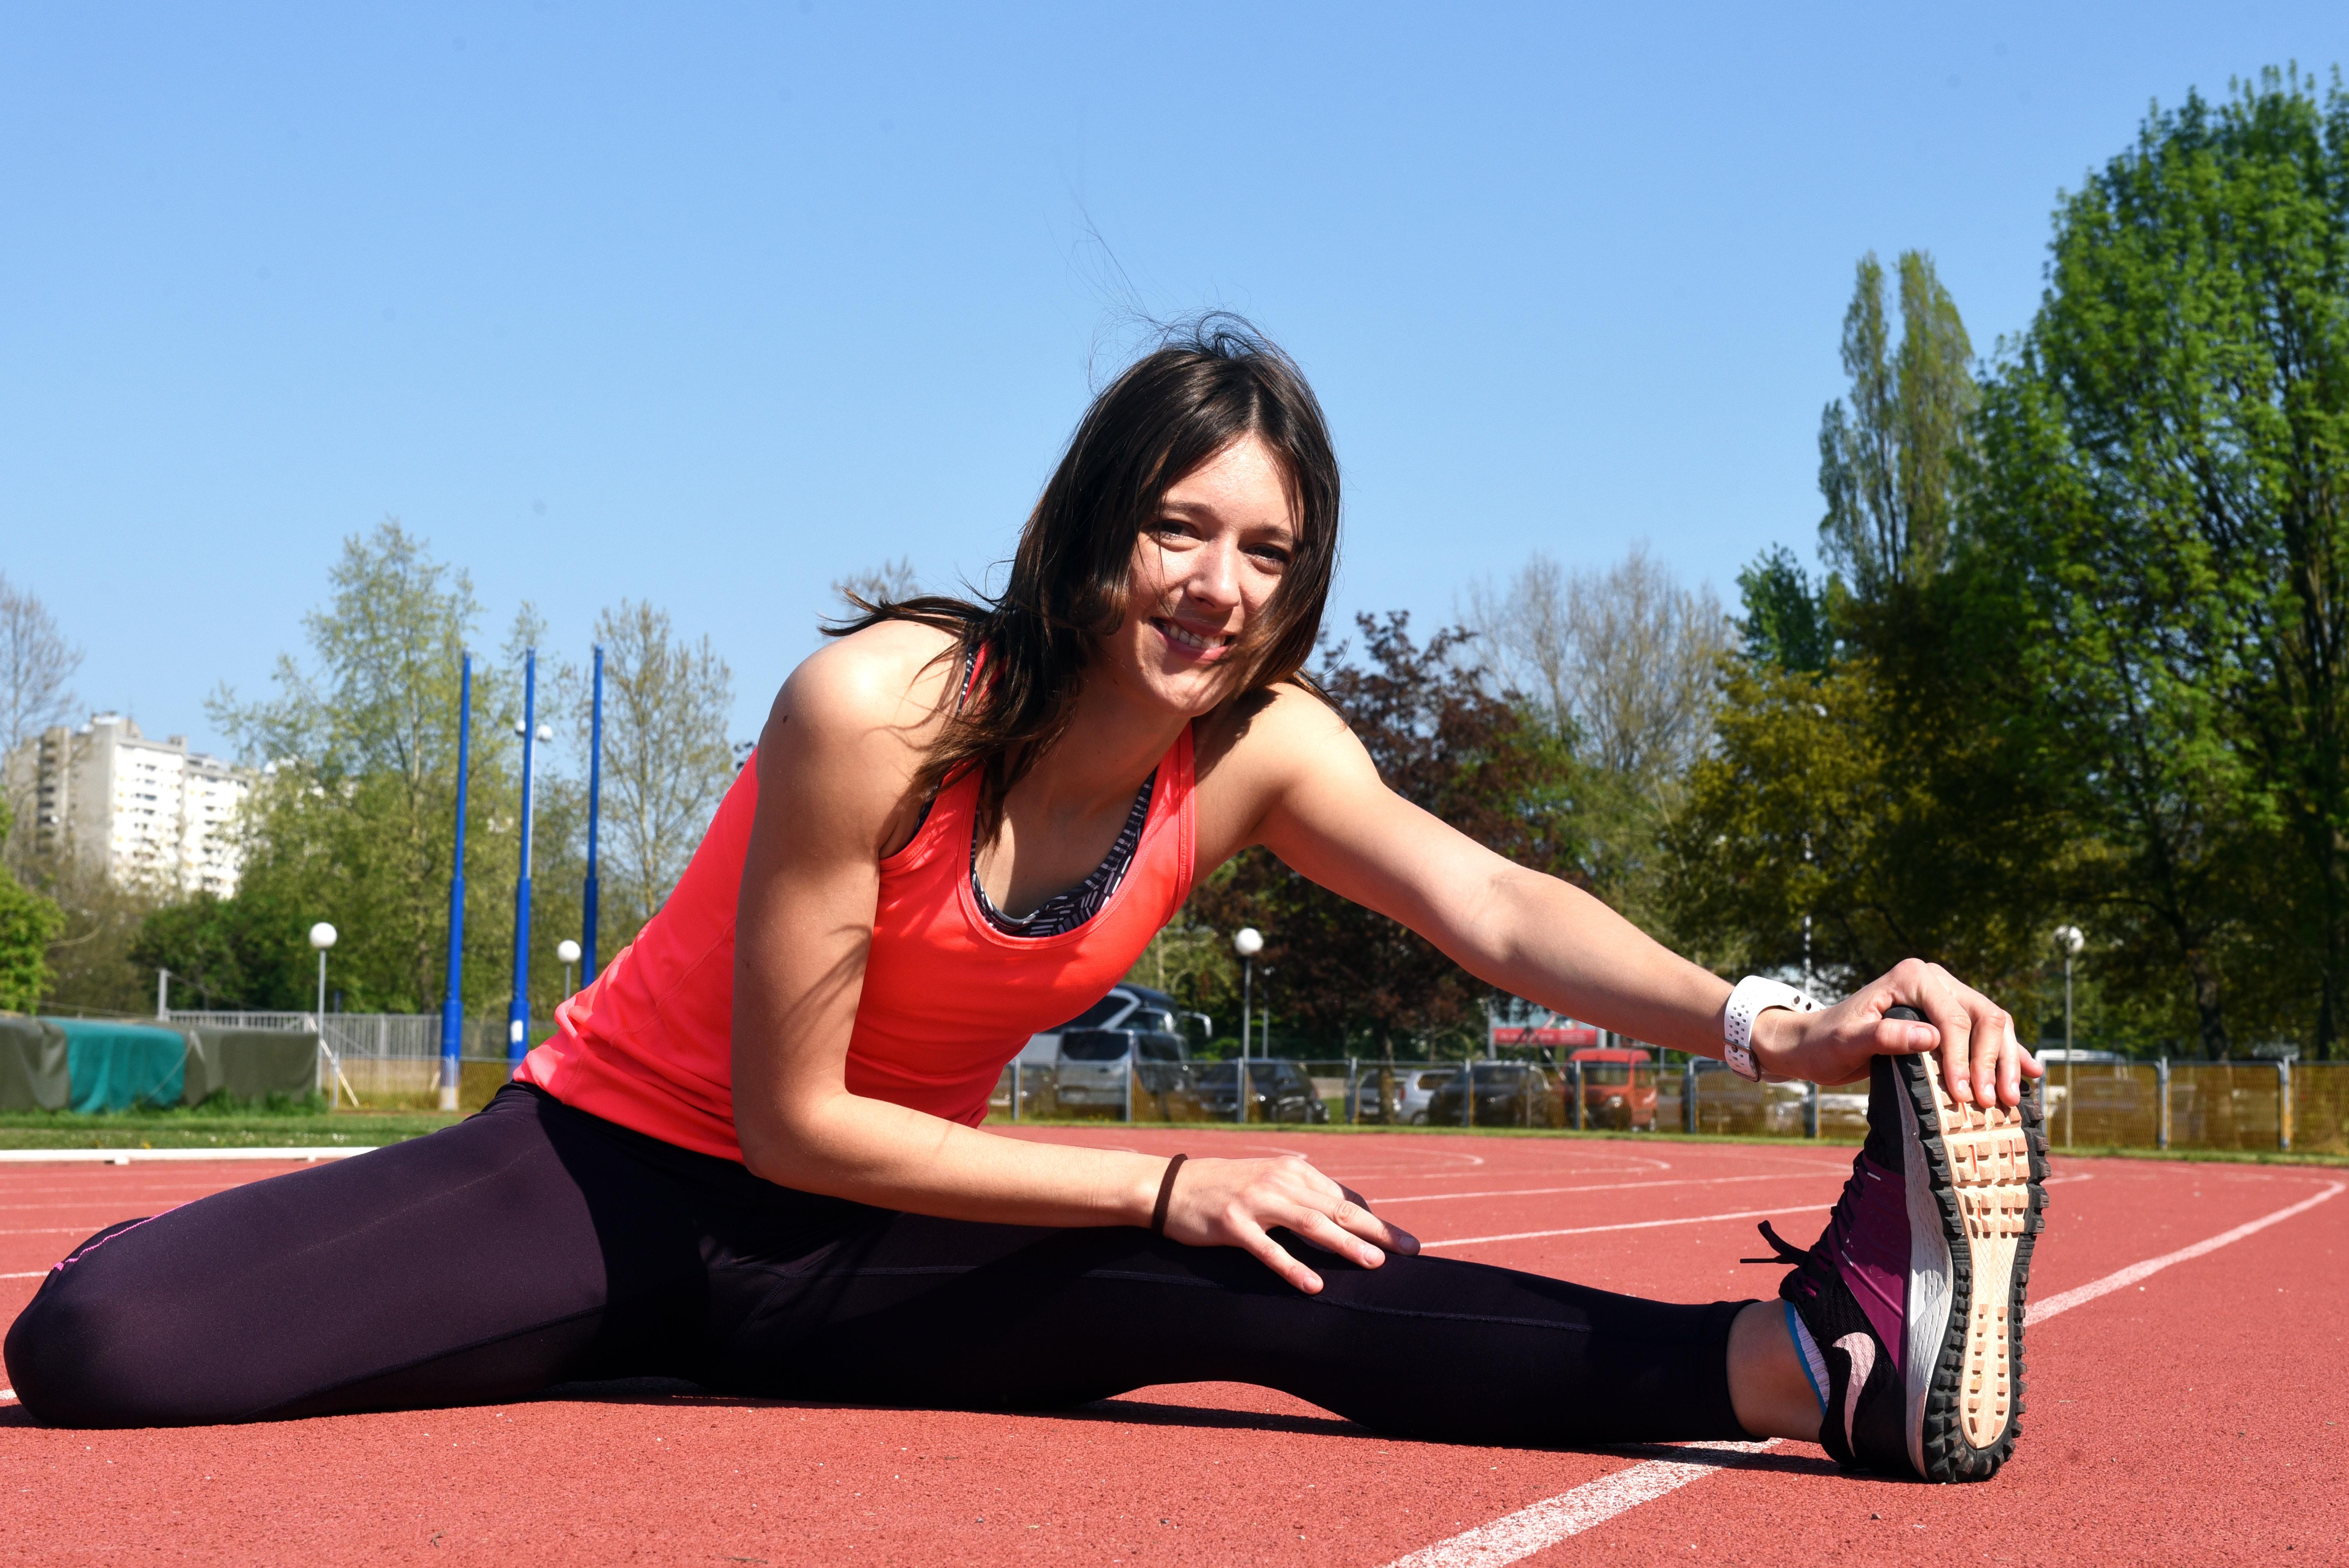 Ana Šimić - vrhunska sportašica i ugovorna pričuvnica OSRH